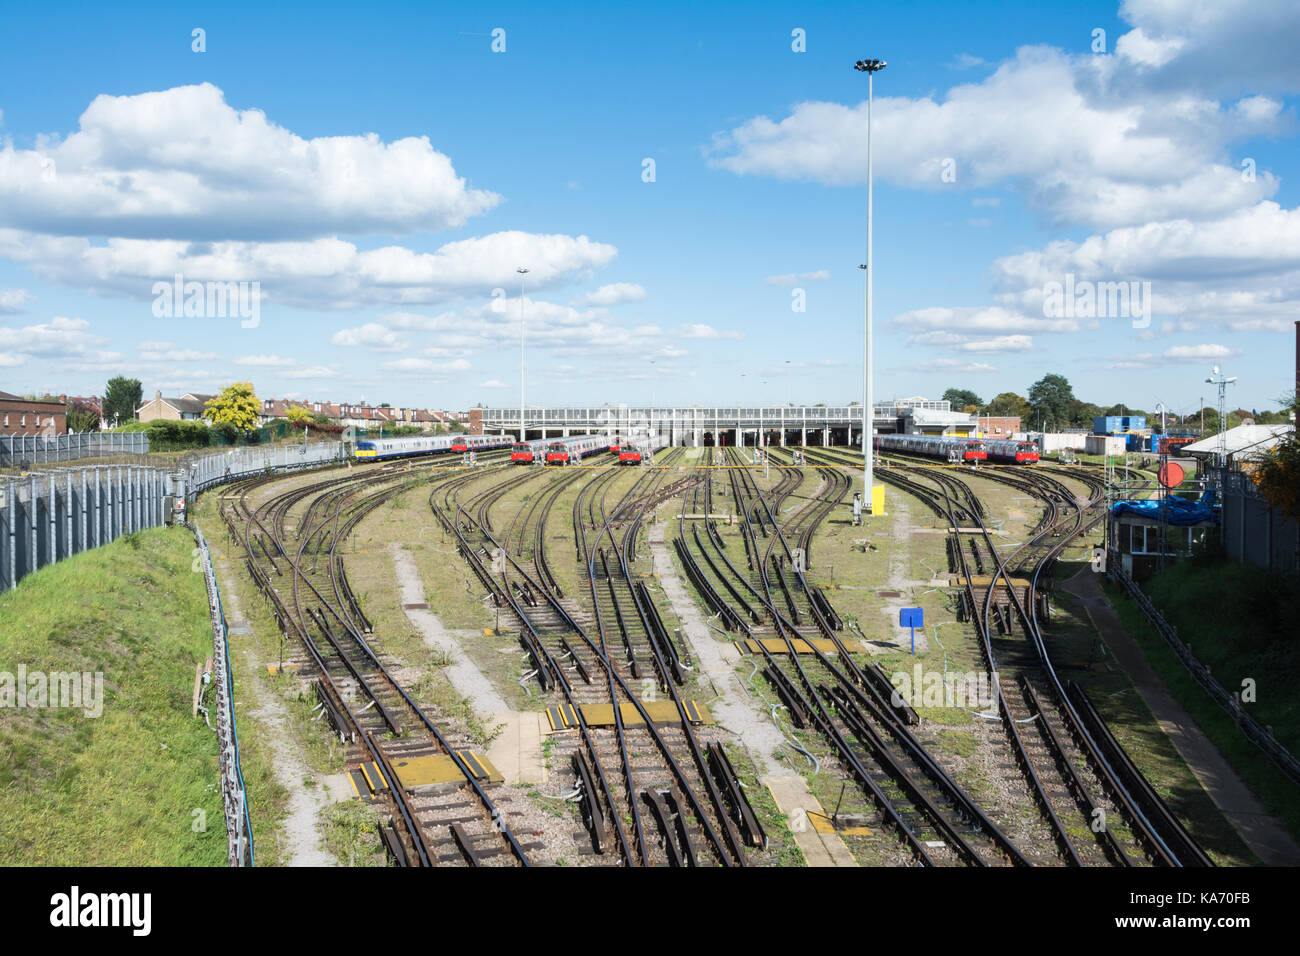 London underground trains outside Northfields Maintenance Depot, London, UK. - Stock Image